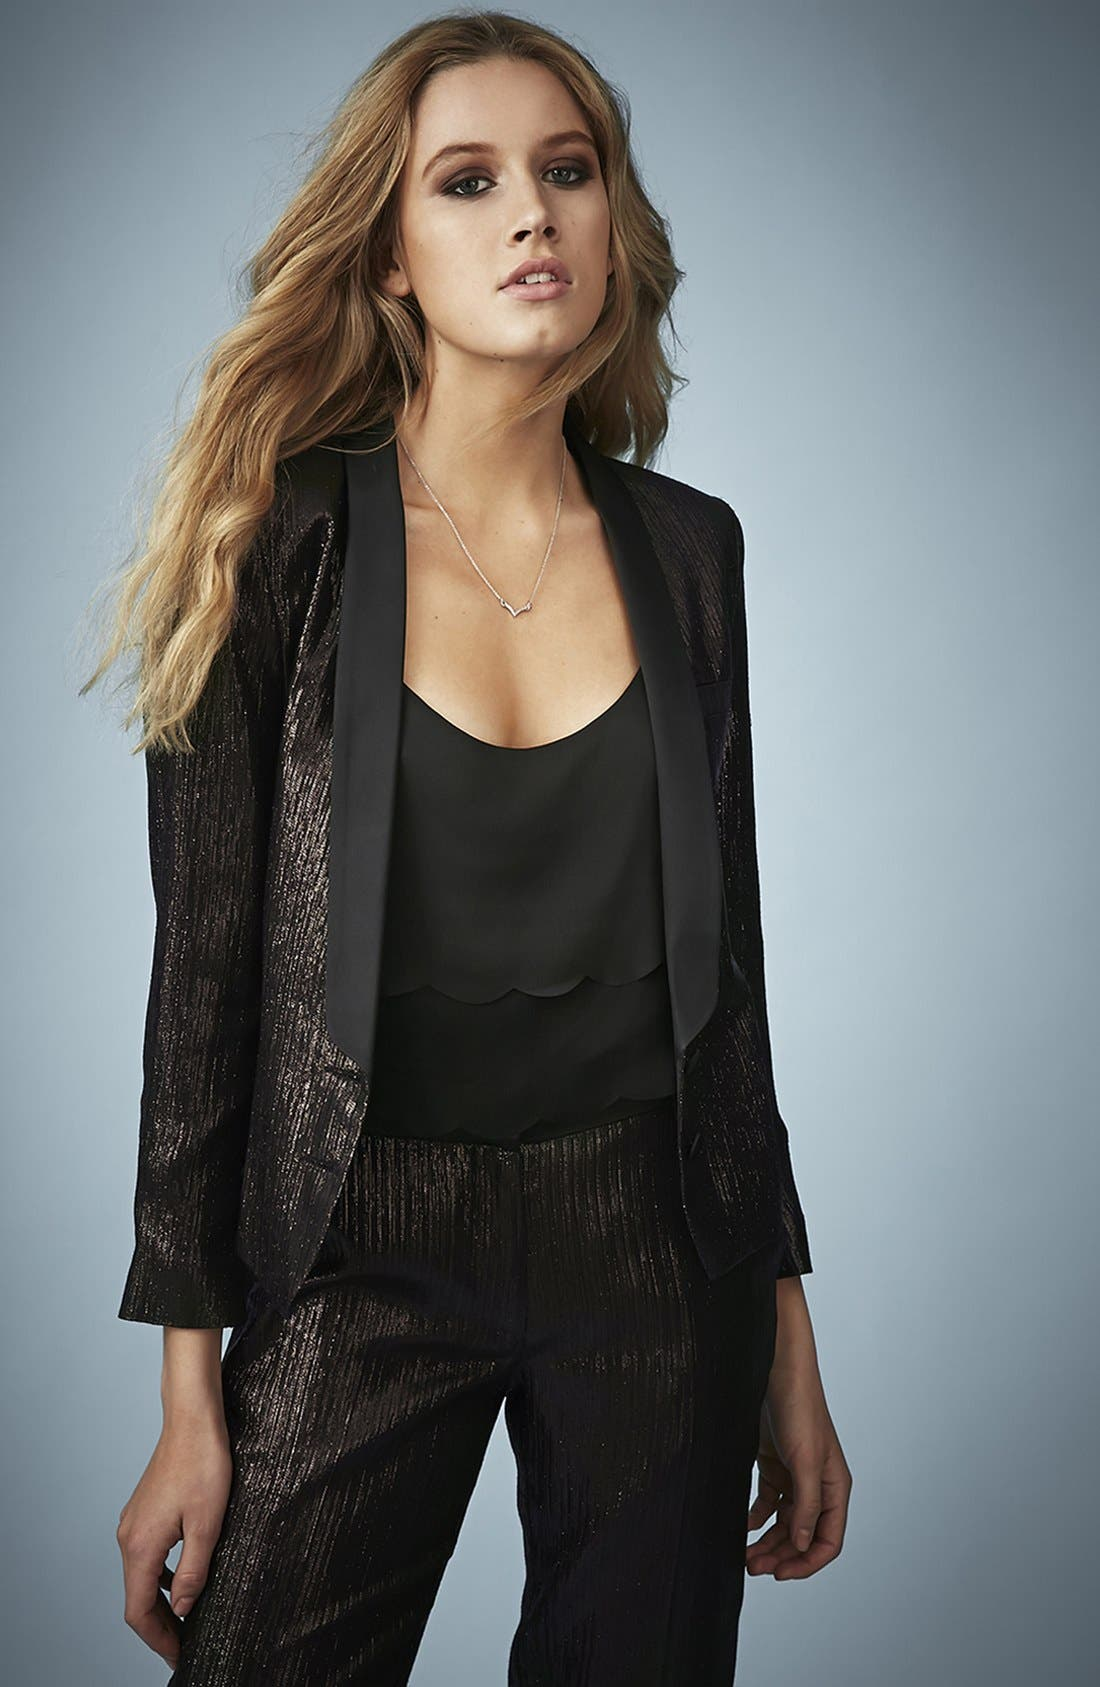 Alternate Image 1 Selected - Kate Moss for Topshop Lamé Tuxedo Jacket